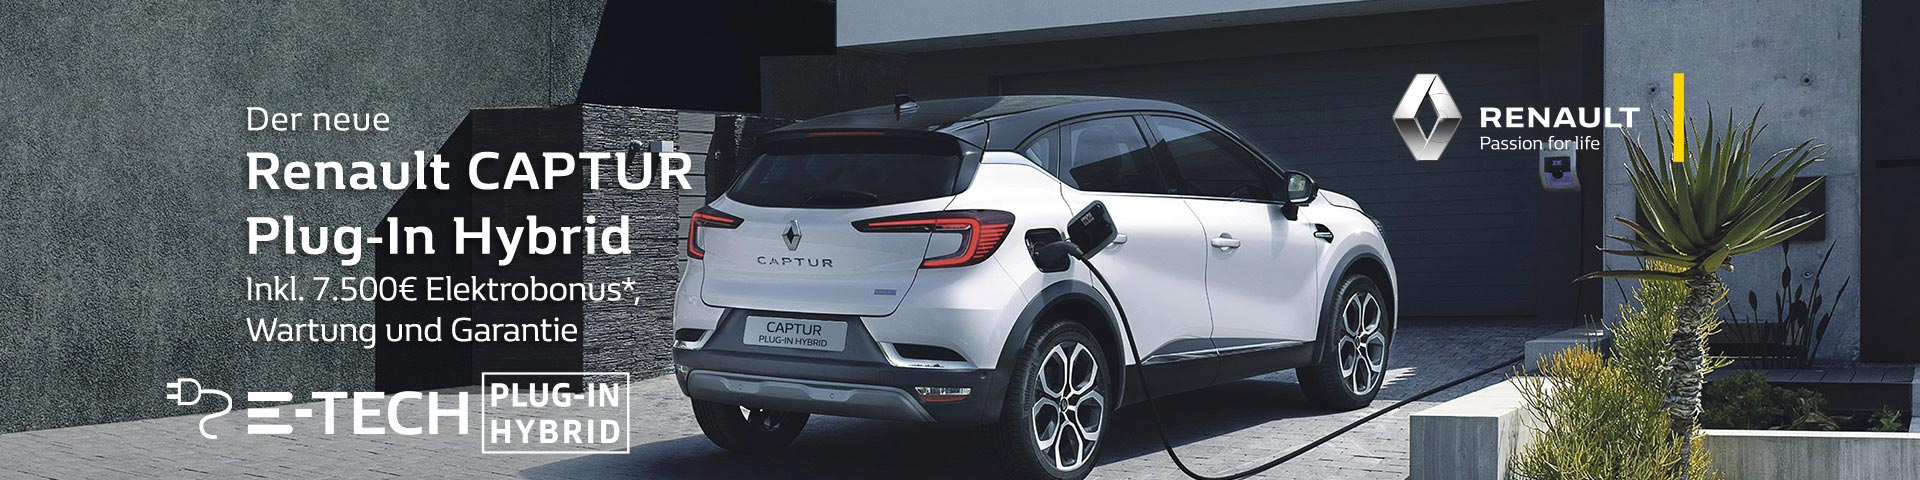 Renault Captur Plugin-Hybrid